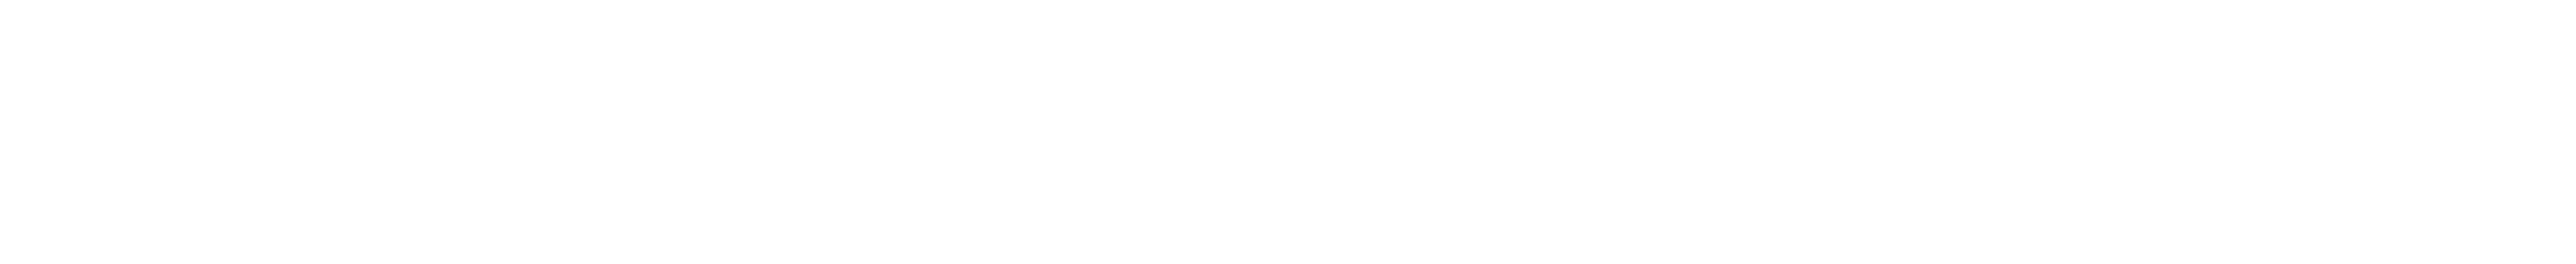 SearchBrain